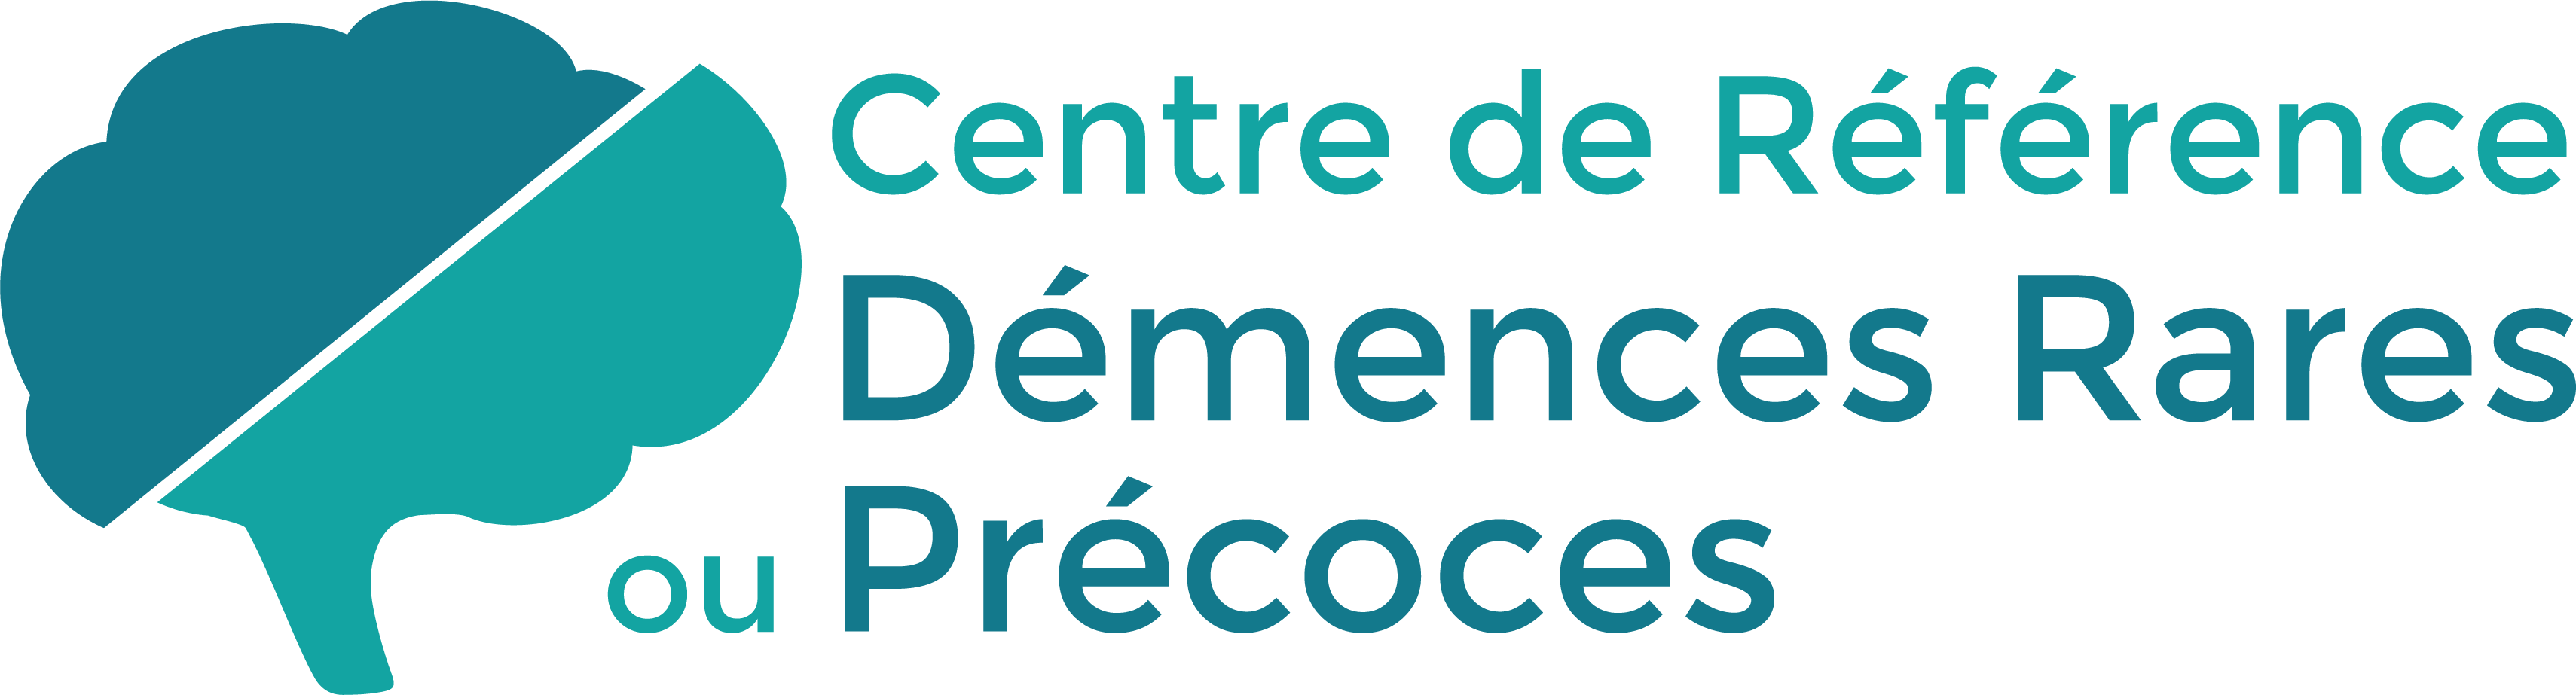 logo démence rare précoces 2017 DEF